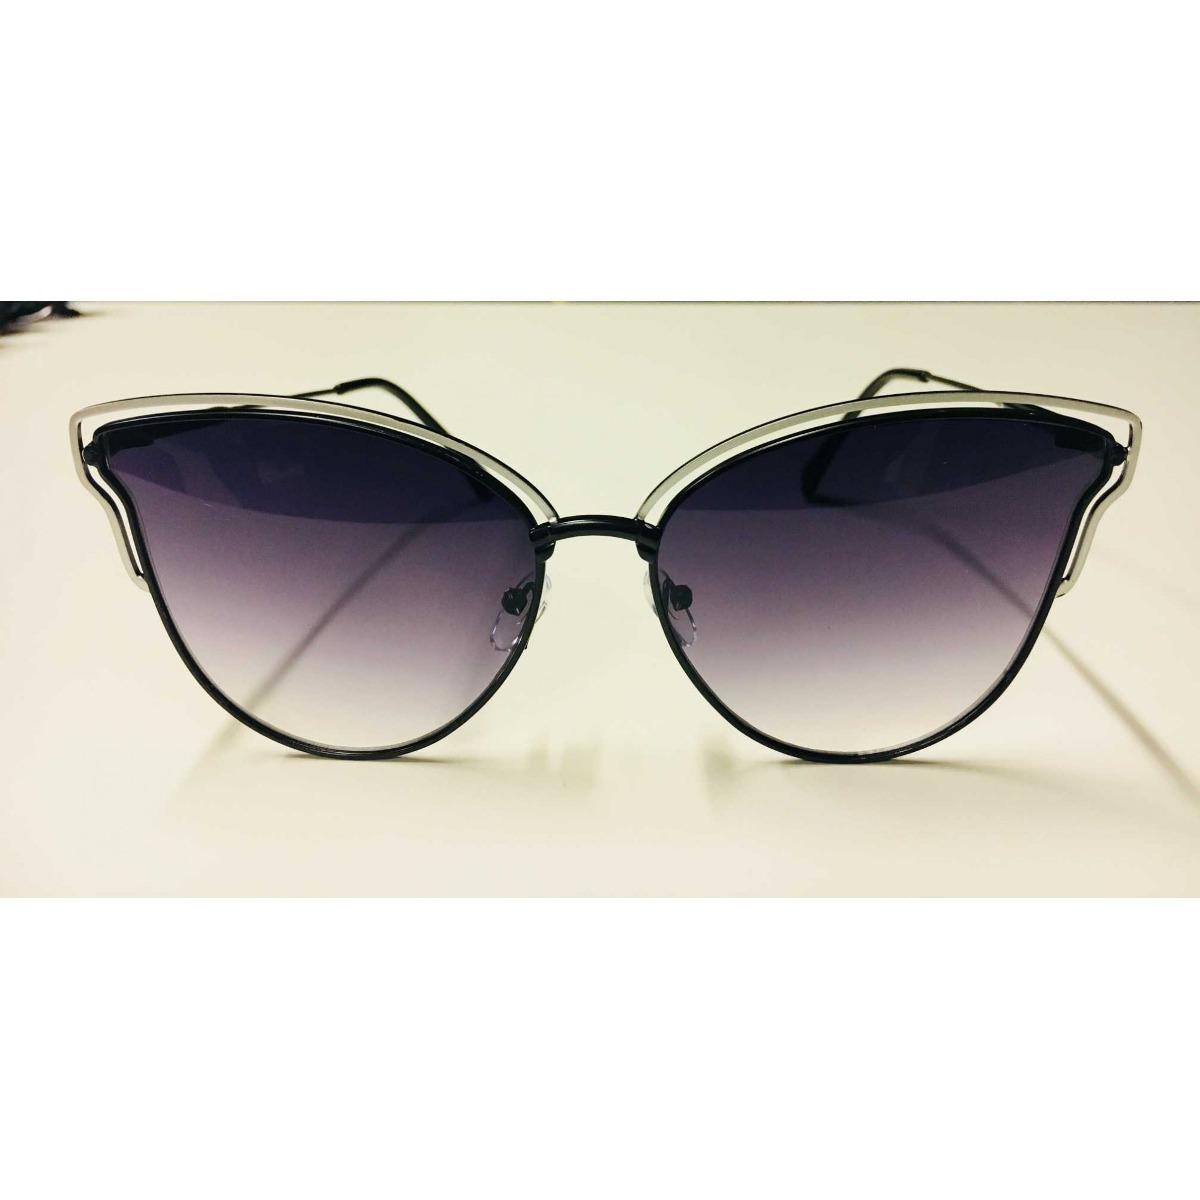 82d79a0704f7c óculos de sol feminino wiikglass borboleta moda 2018 preto. Carregando zoom.